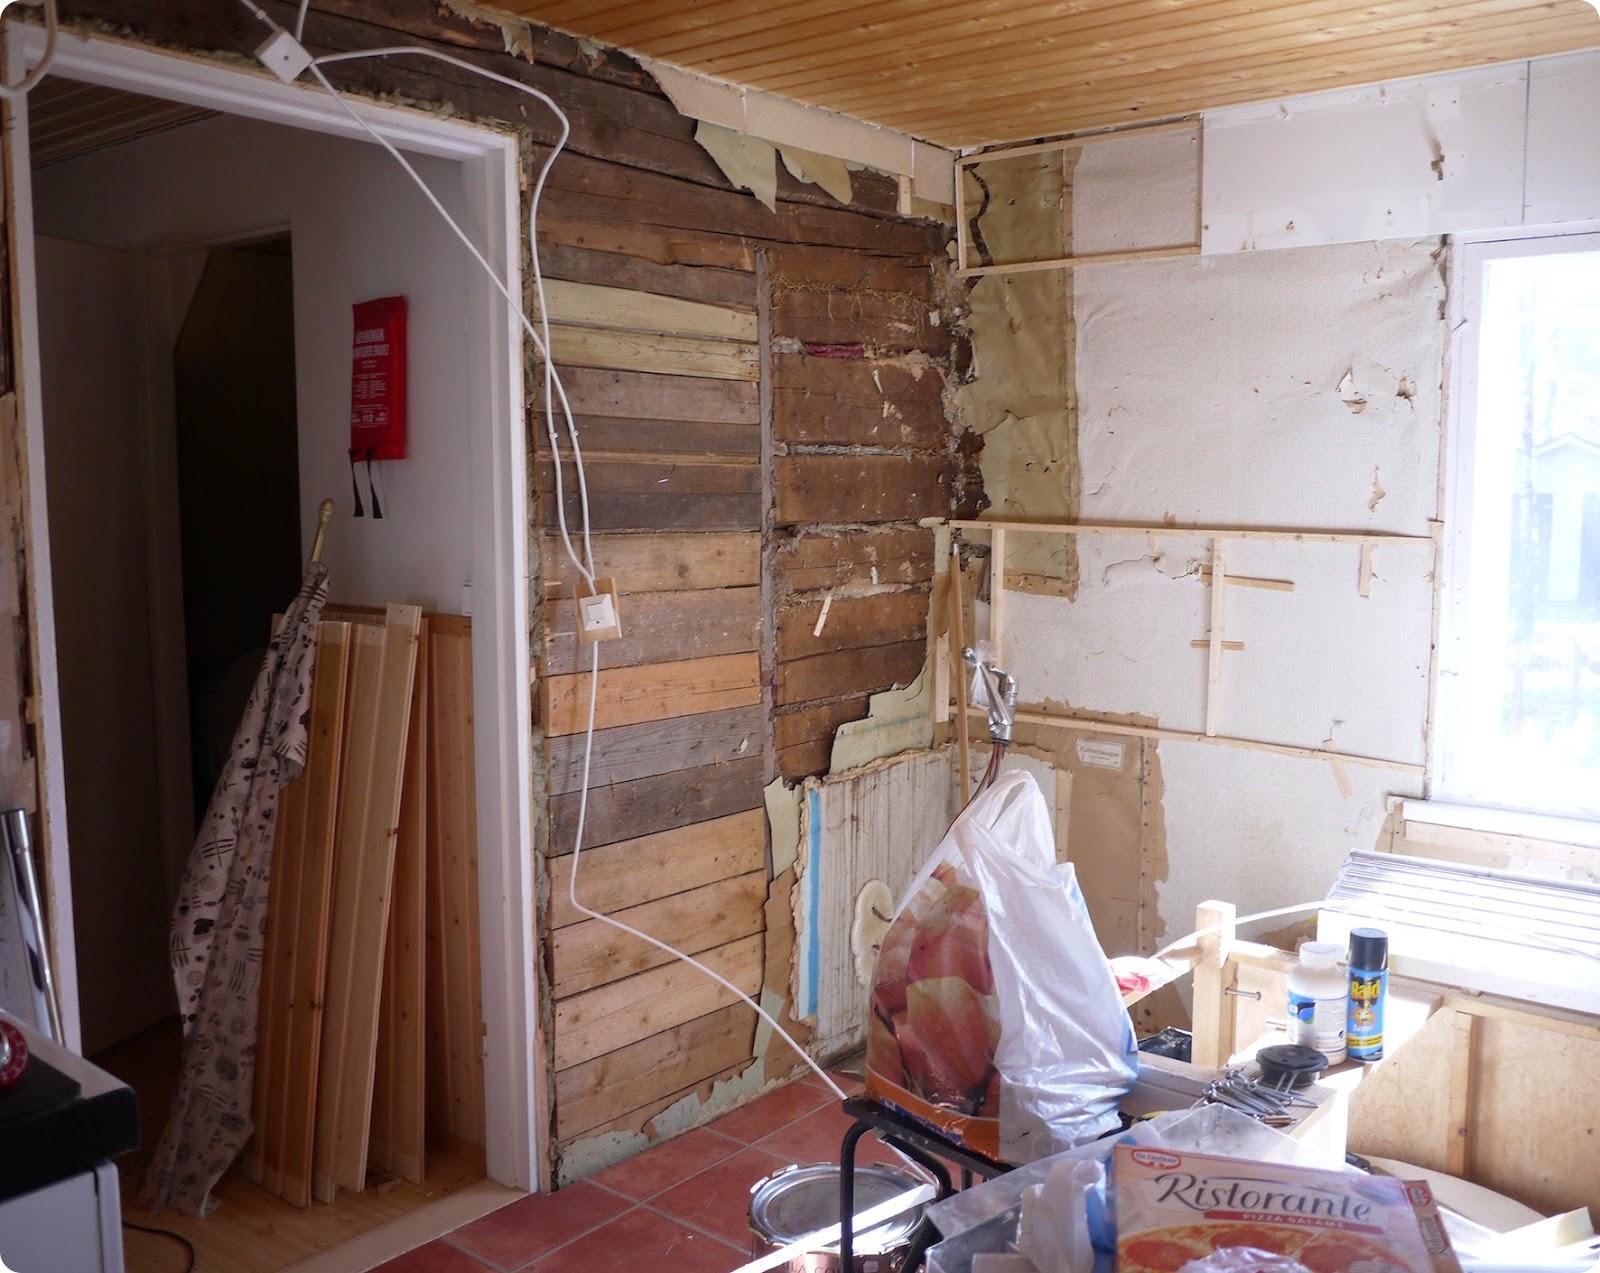 Mekkala Luku 1 Vanhan keittiön purku